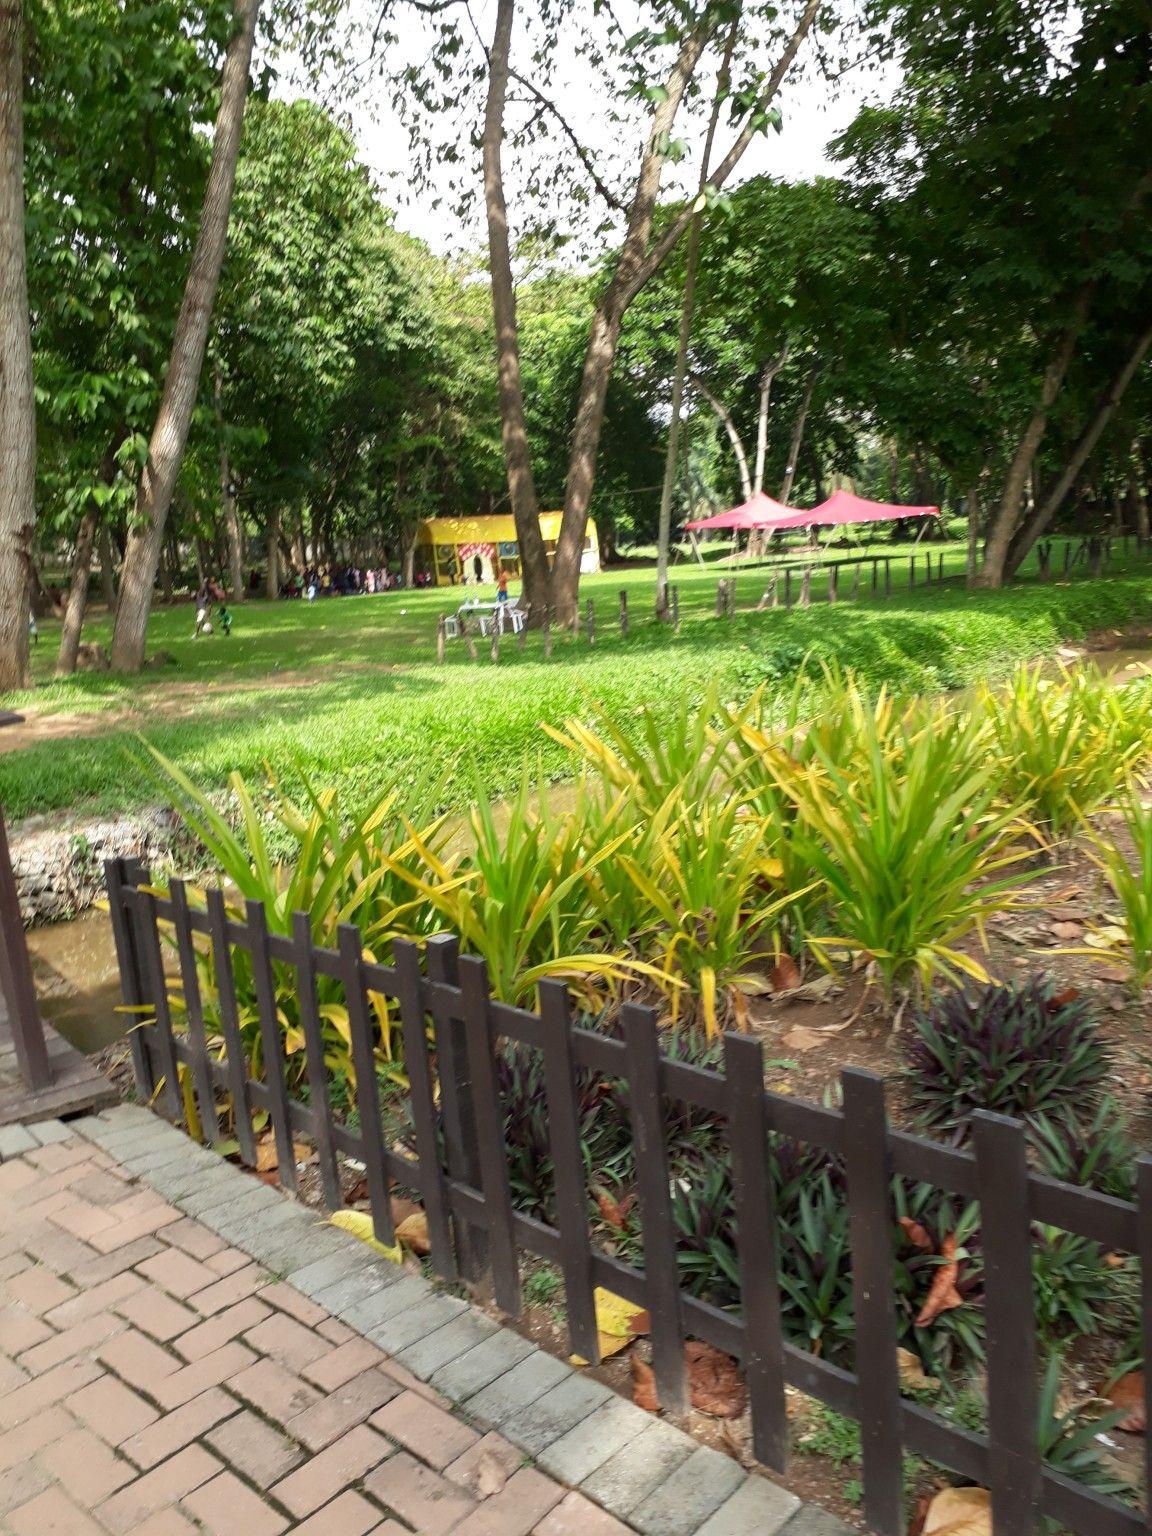 9a414865333dfebb3ab382512e33456a - Hotels Close To Agodi Gardens Ibadan